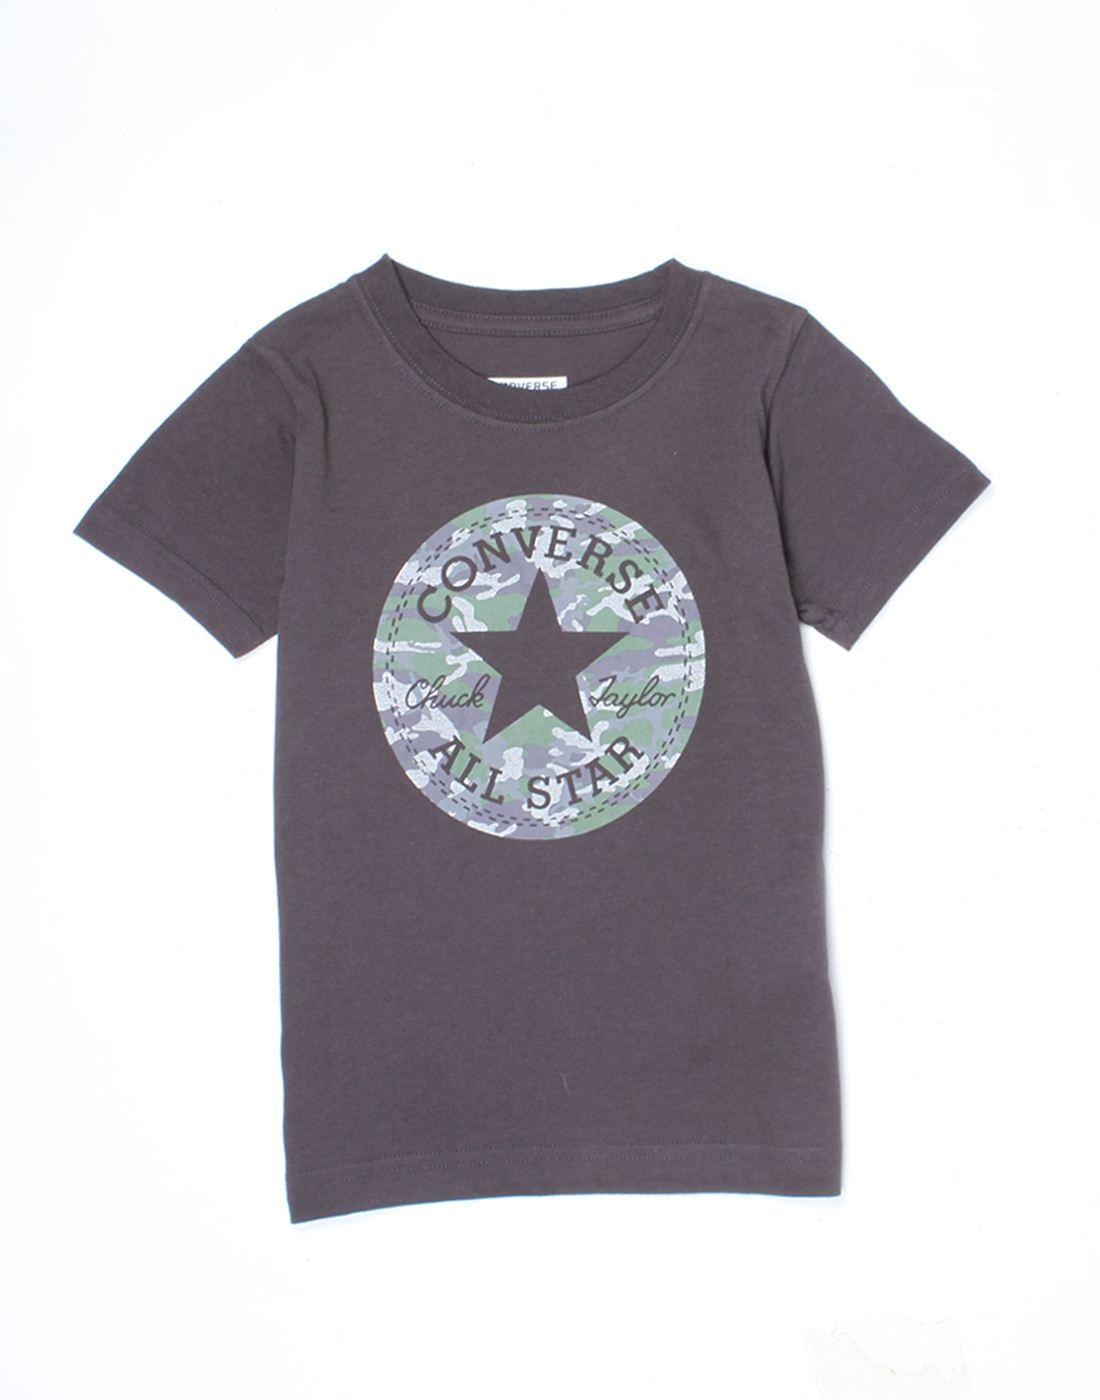 Converse Boys Purple T-Shirt